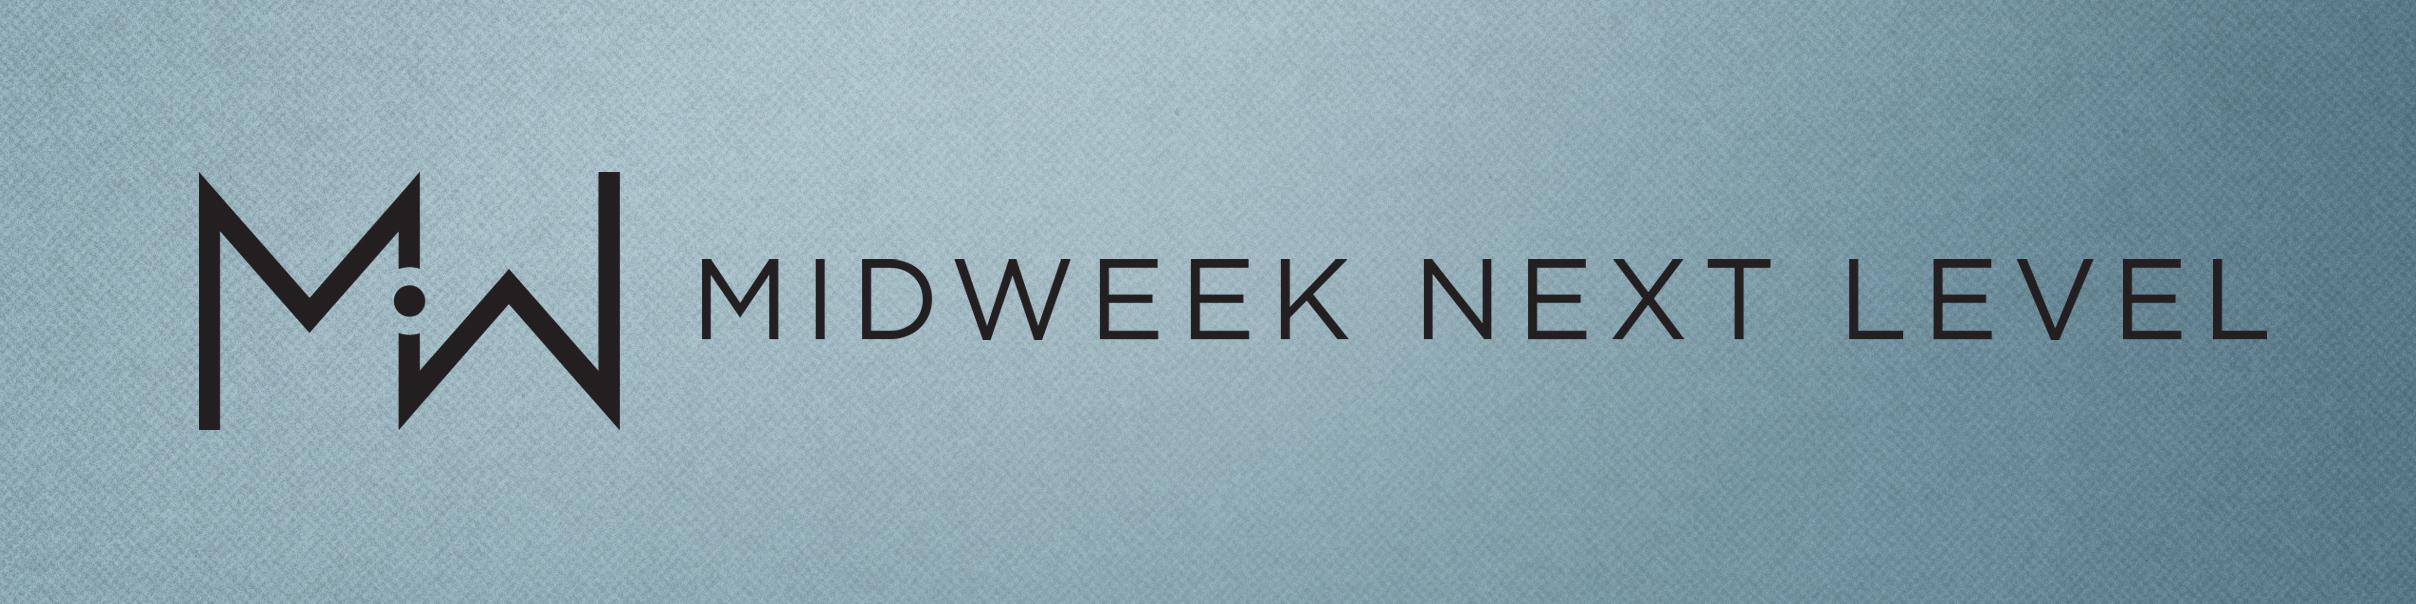 Midweek next level web